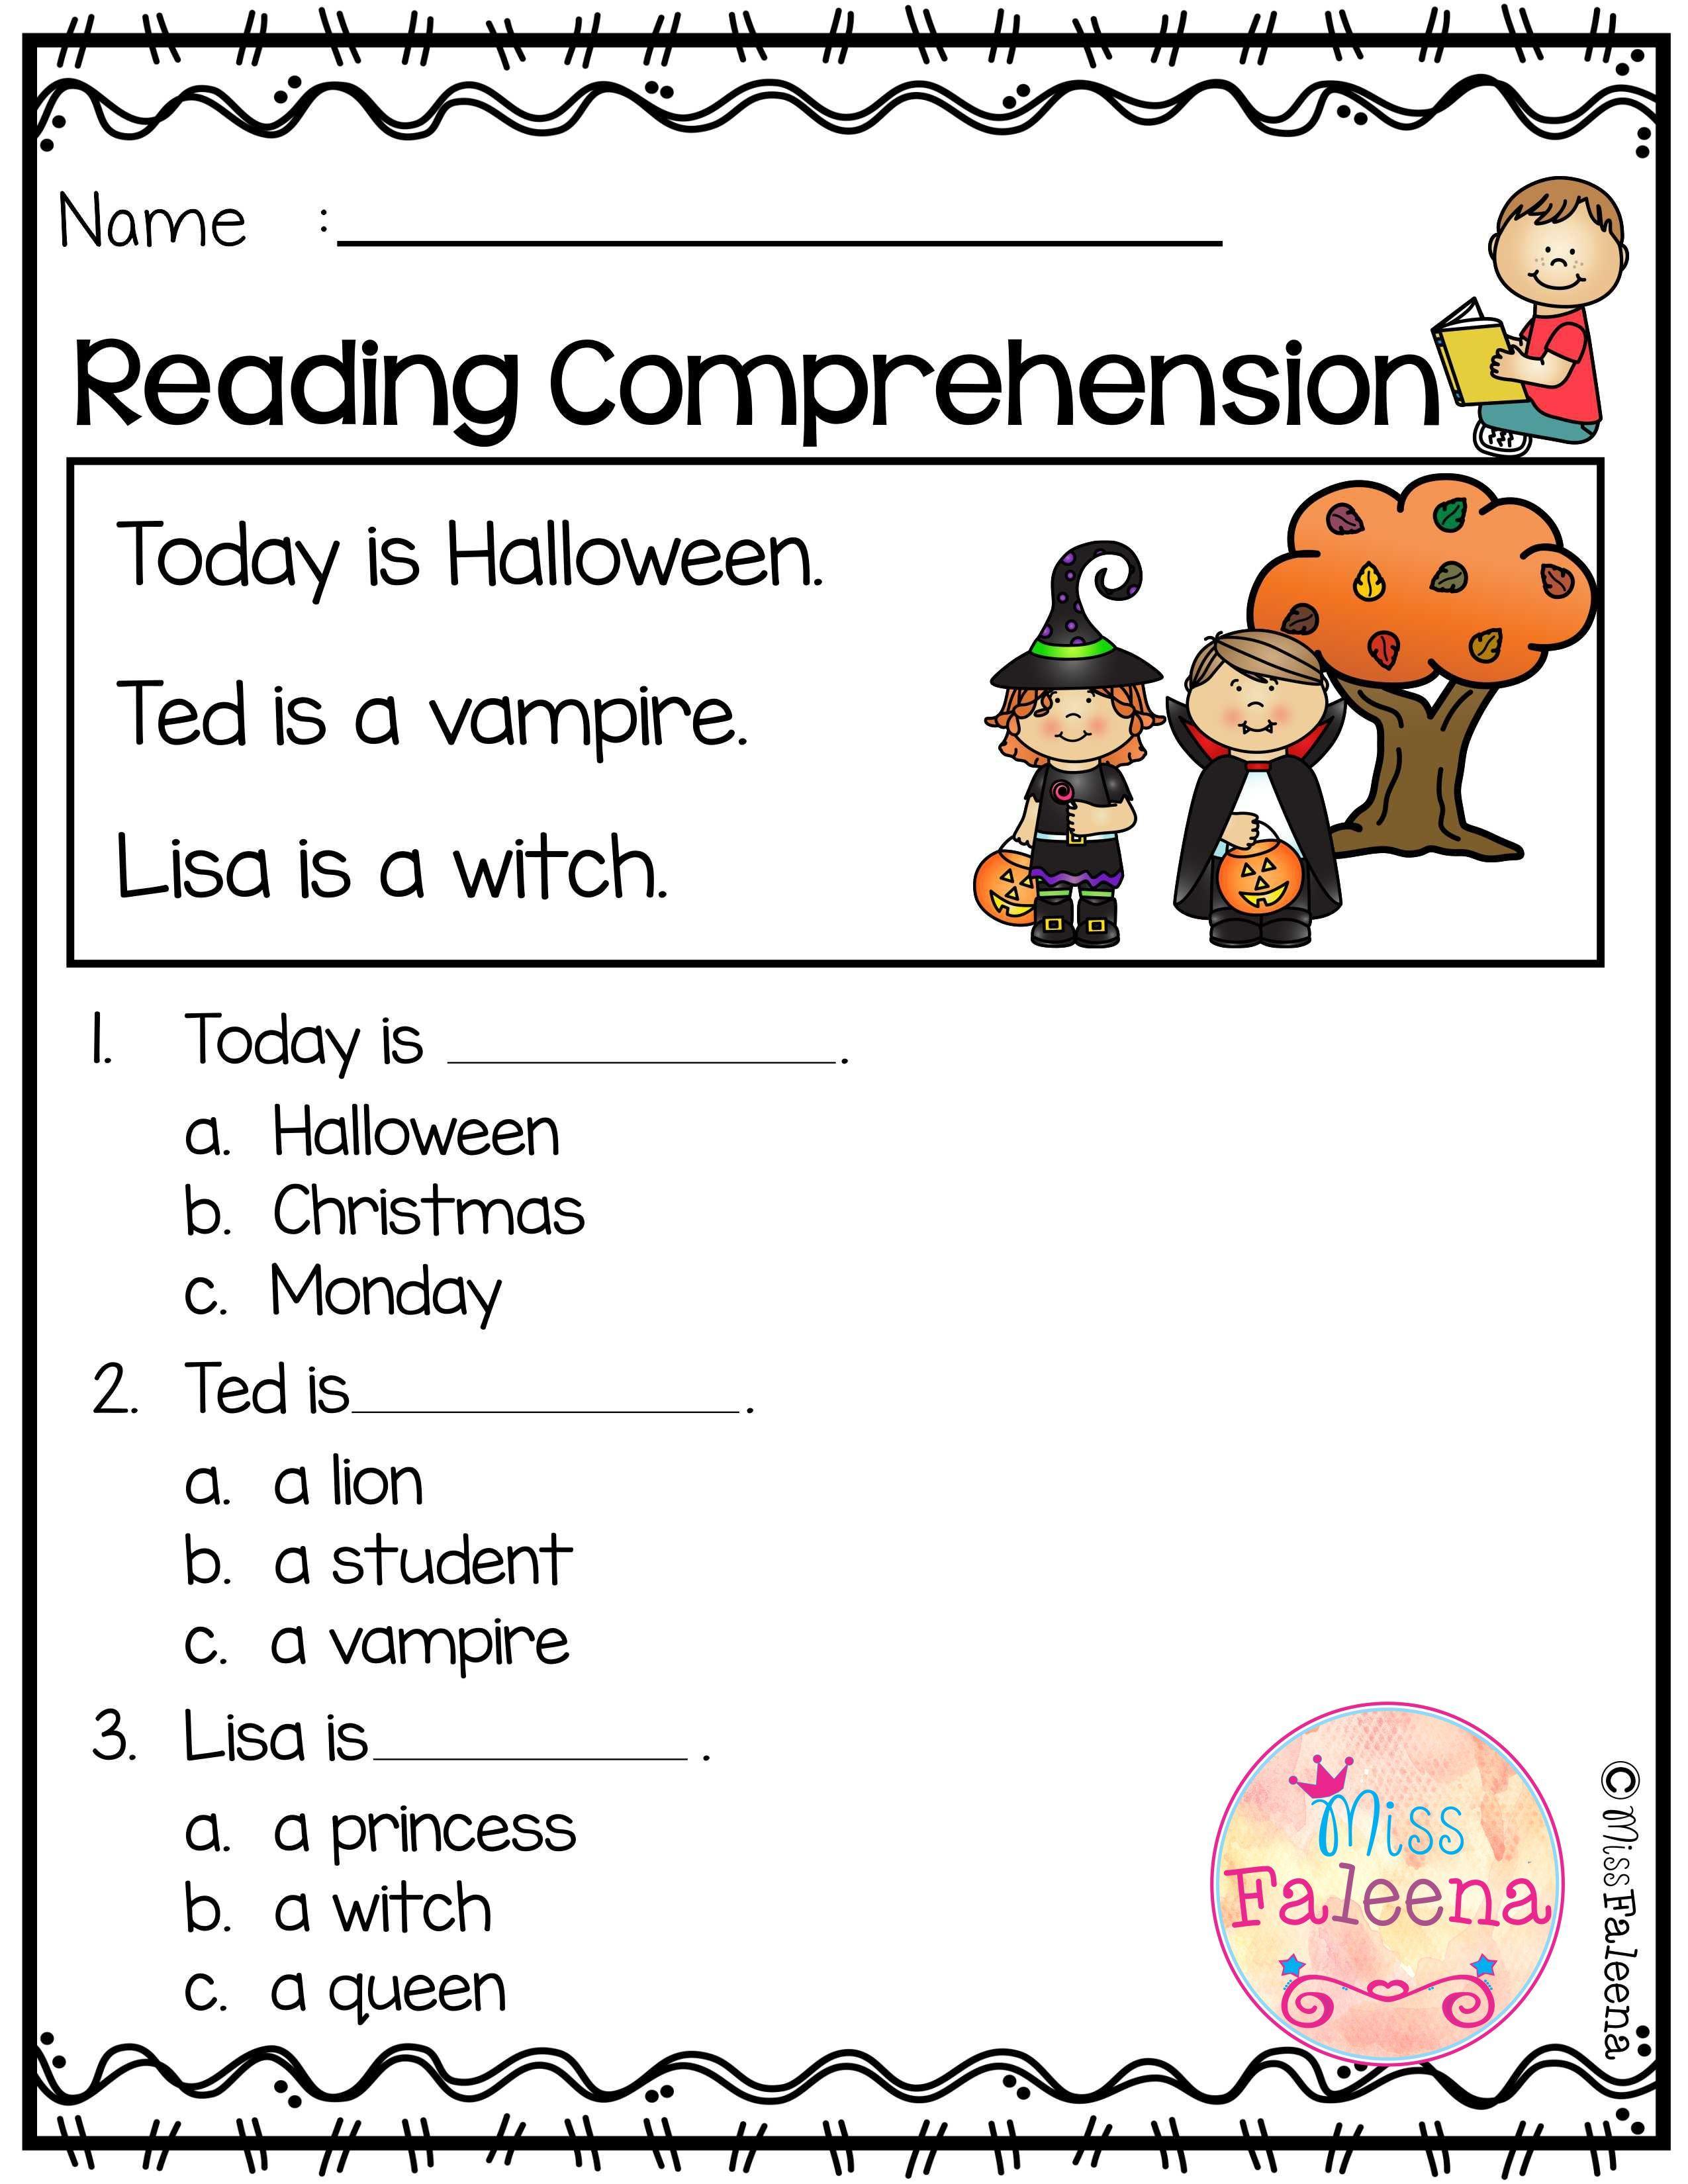 October Reading Comprehension Is Suitable For Kindergarten Students Or Beginning Reading Comprehension Preschool Classroom Organization Preschool Lesson Plans [ 3300 x 2550 Pixel ]